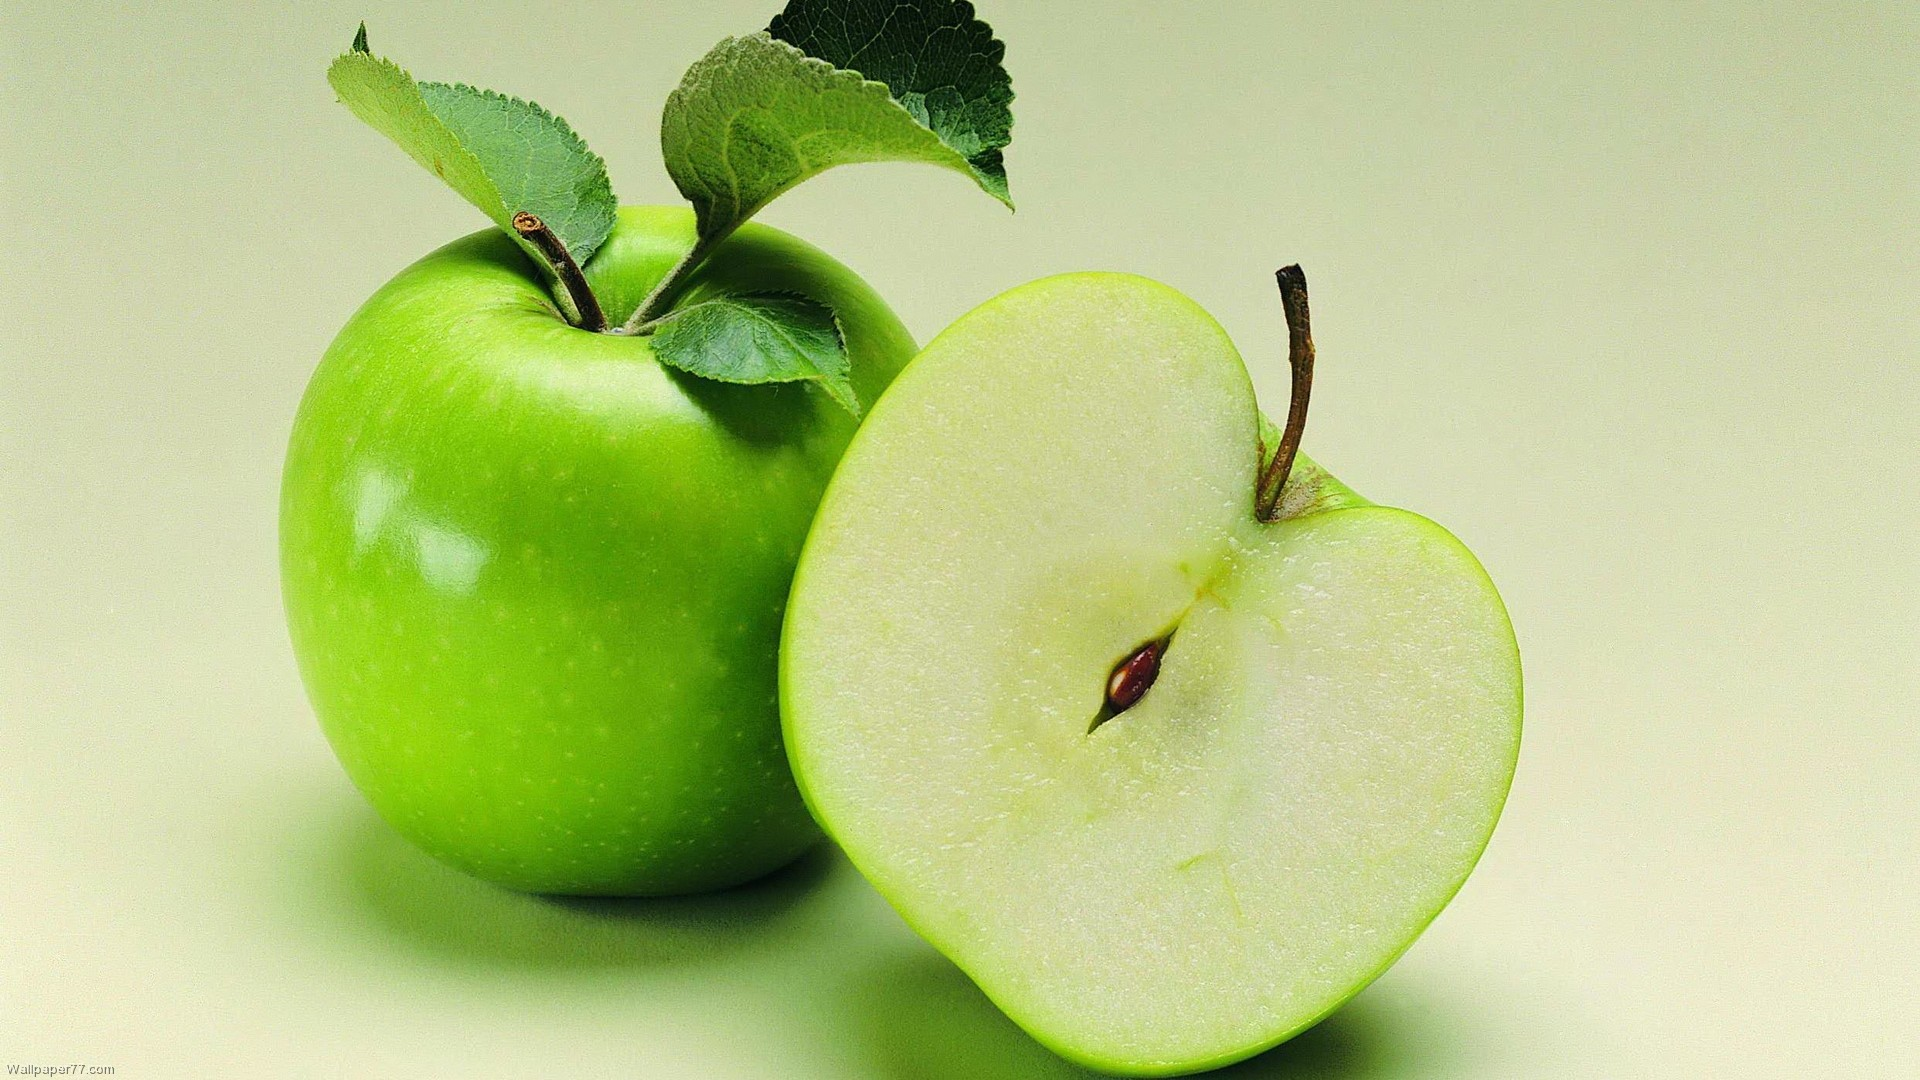 Fruit apple wallpaper - Food Fruit Apple